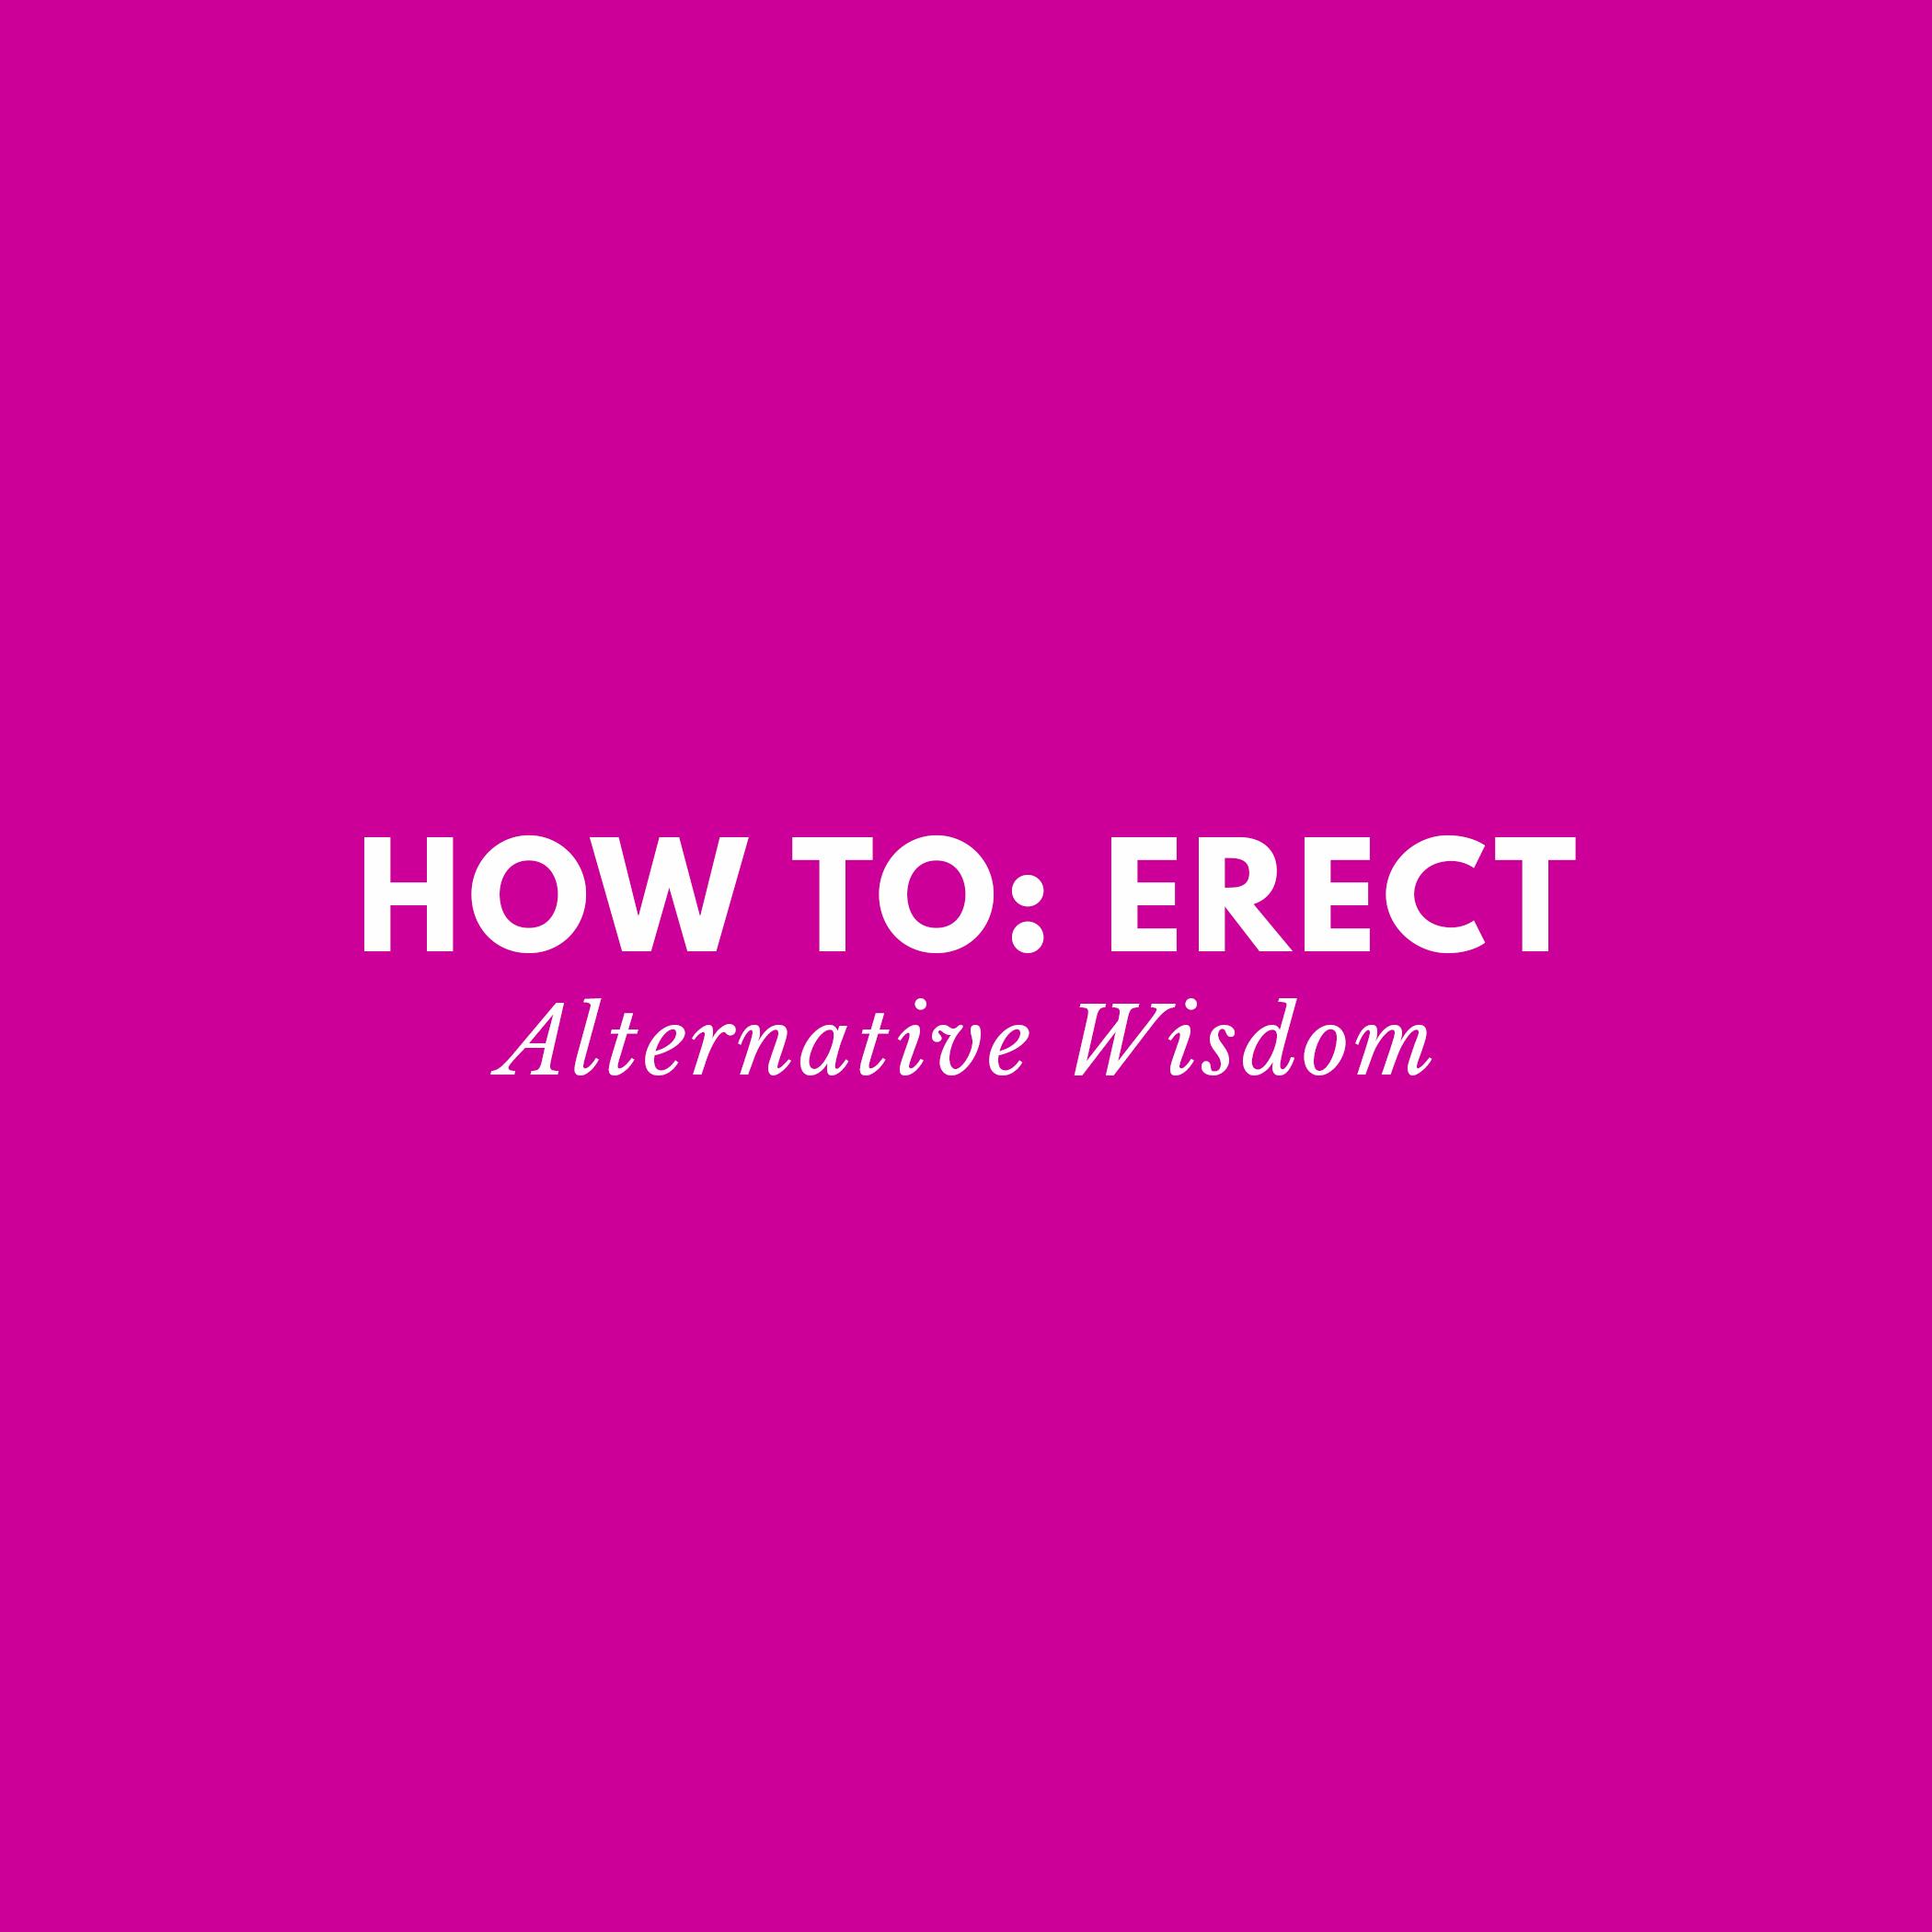 HowToErect-Title.jpg